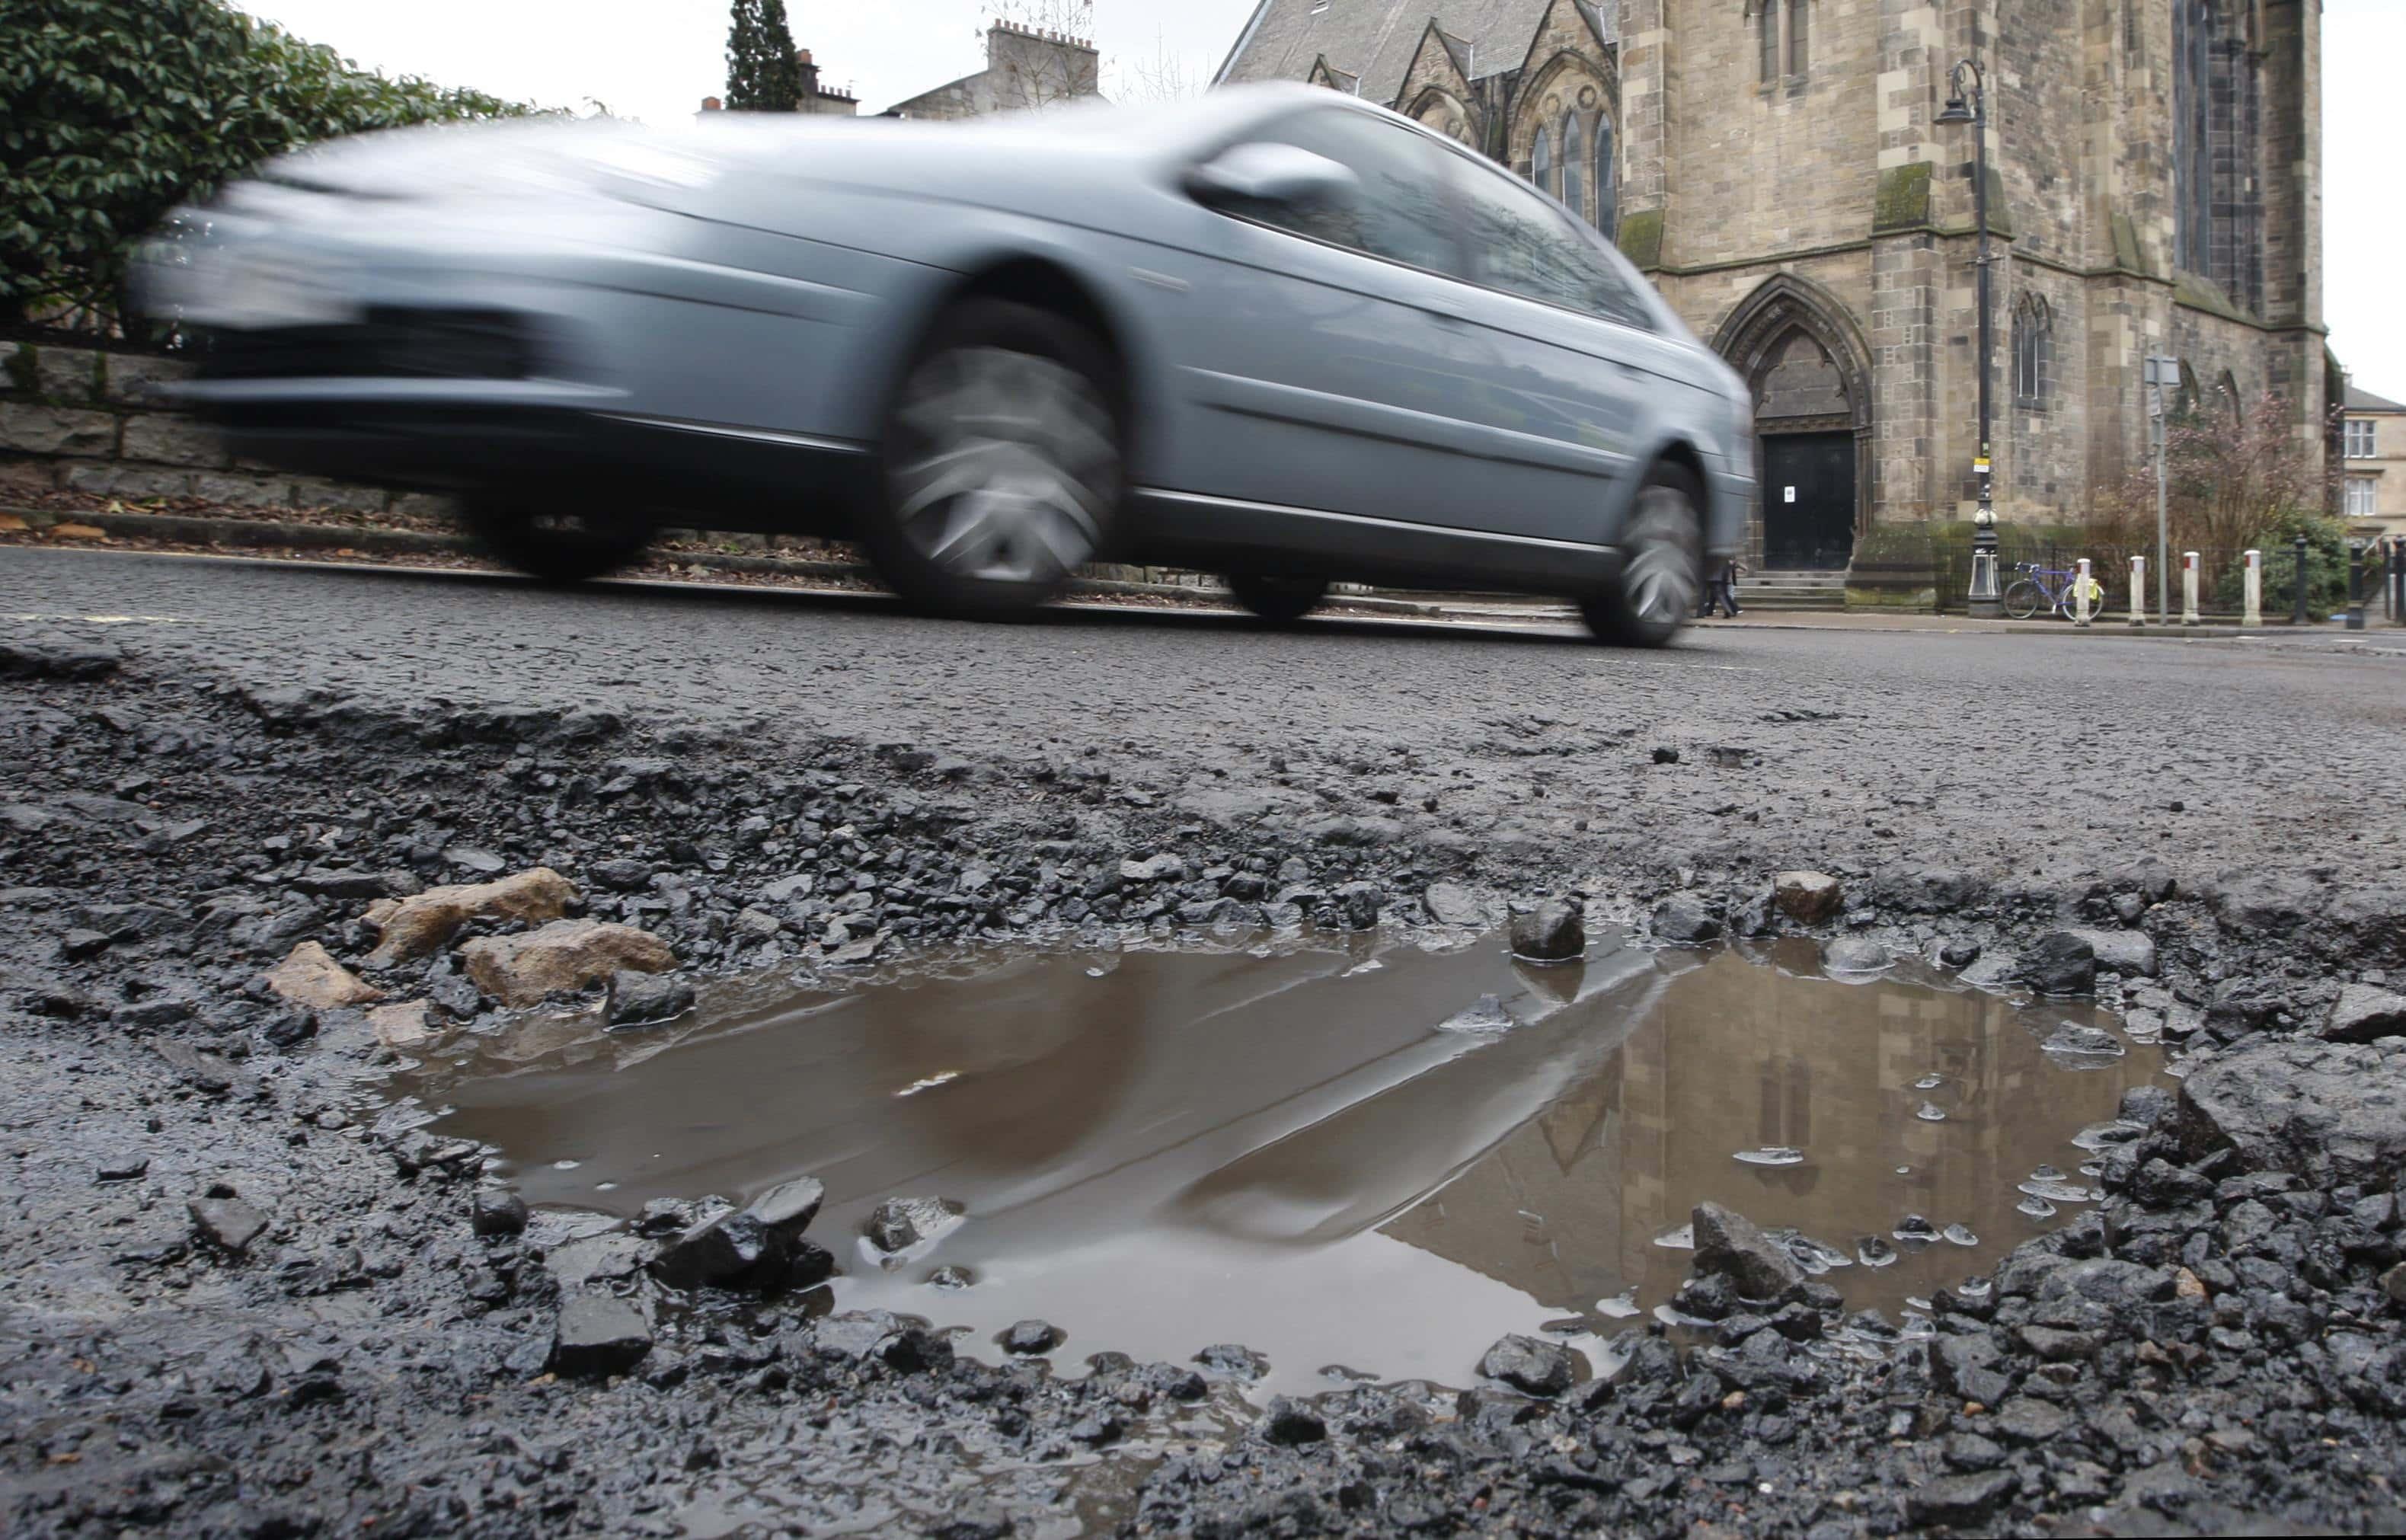 Council Disagree Over Sunderland Potholes